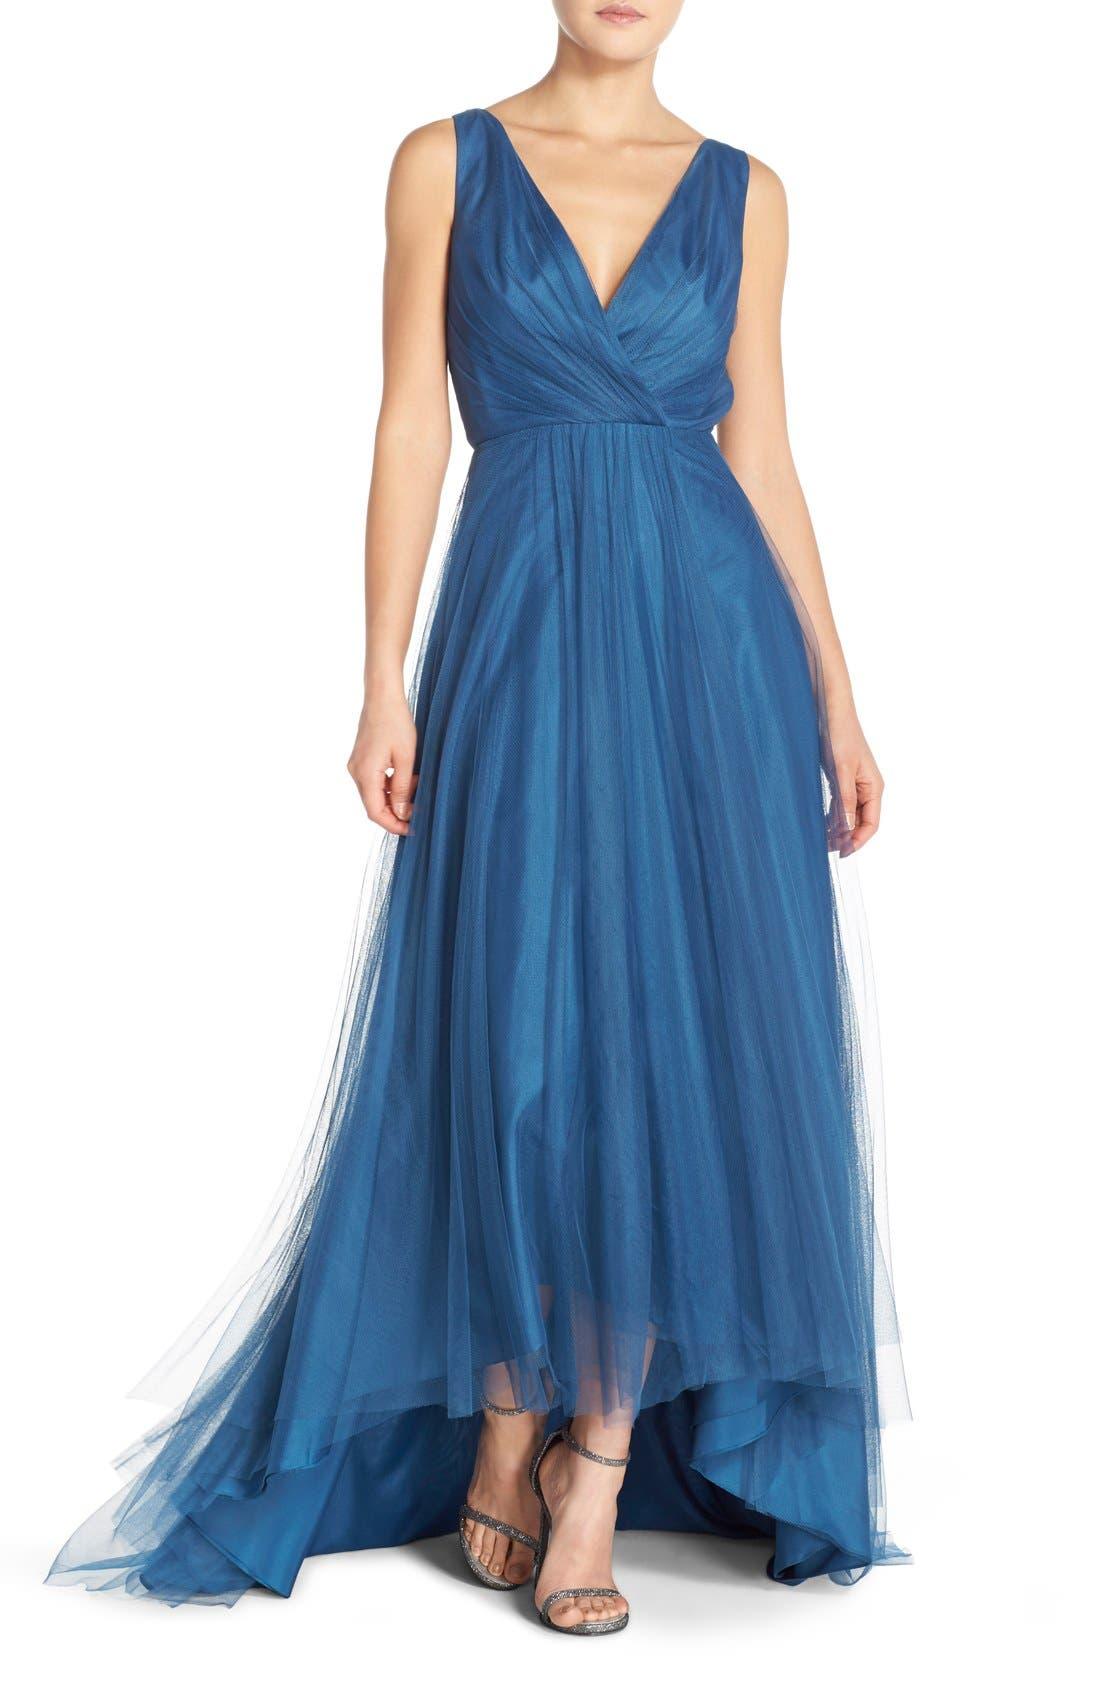 Alternate Image 1 Selected - Monique Lhuillier Bridesmaids Pleat Tulle V-Neck High/Low Gown